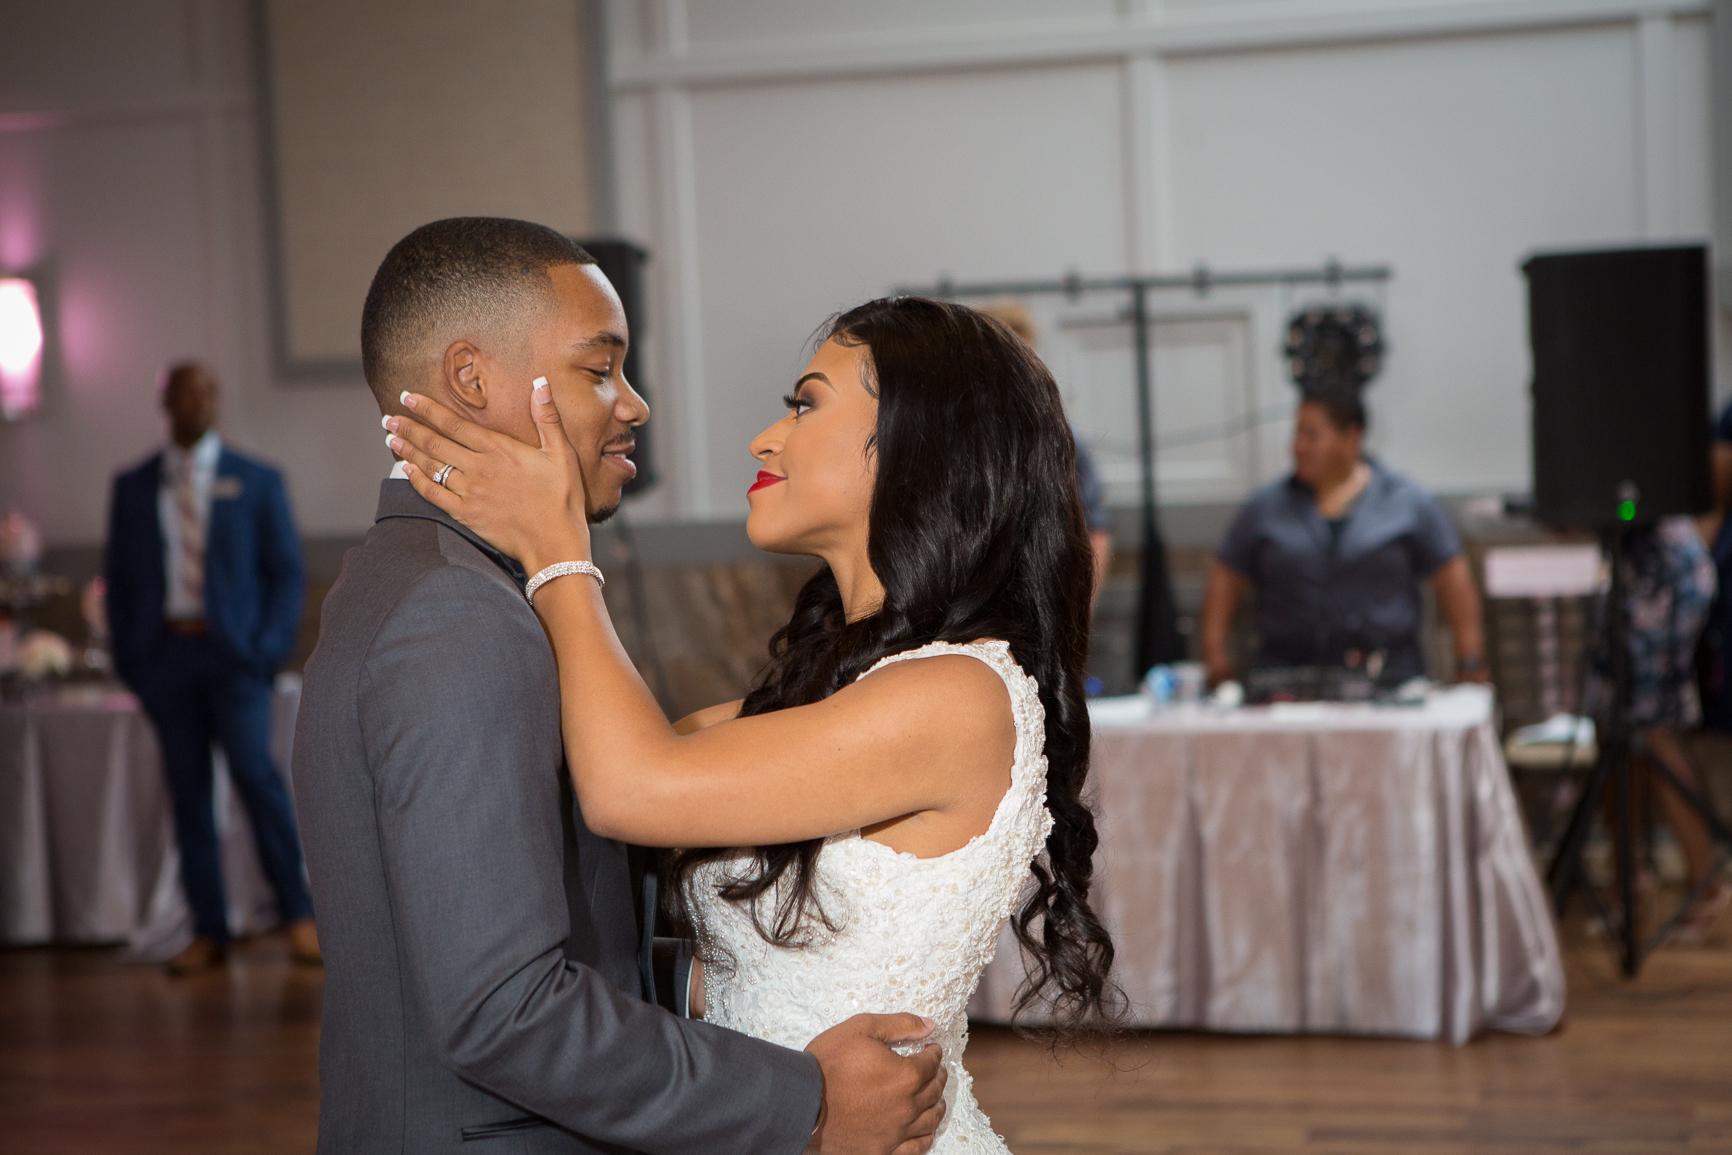 Noah Raleigh wedding photographer - 101 studio llc -66.jpg